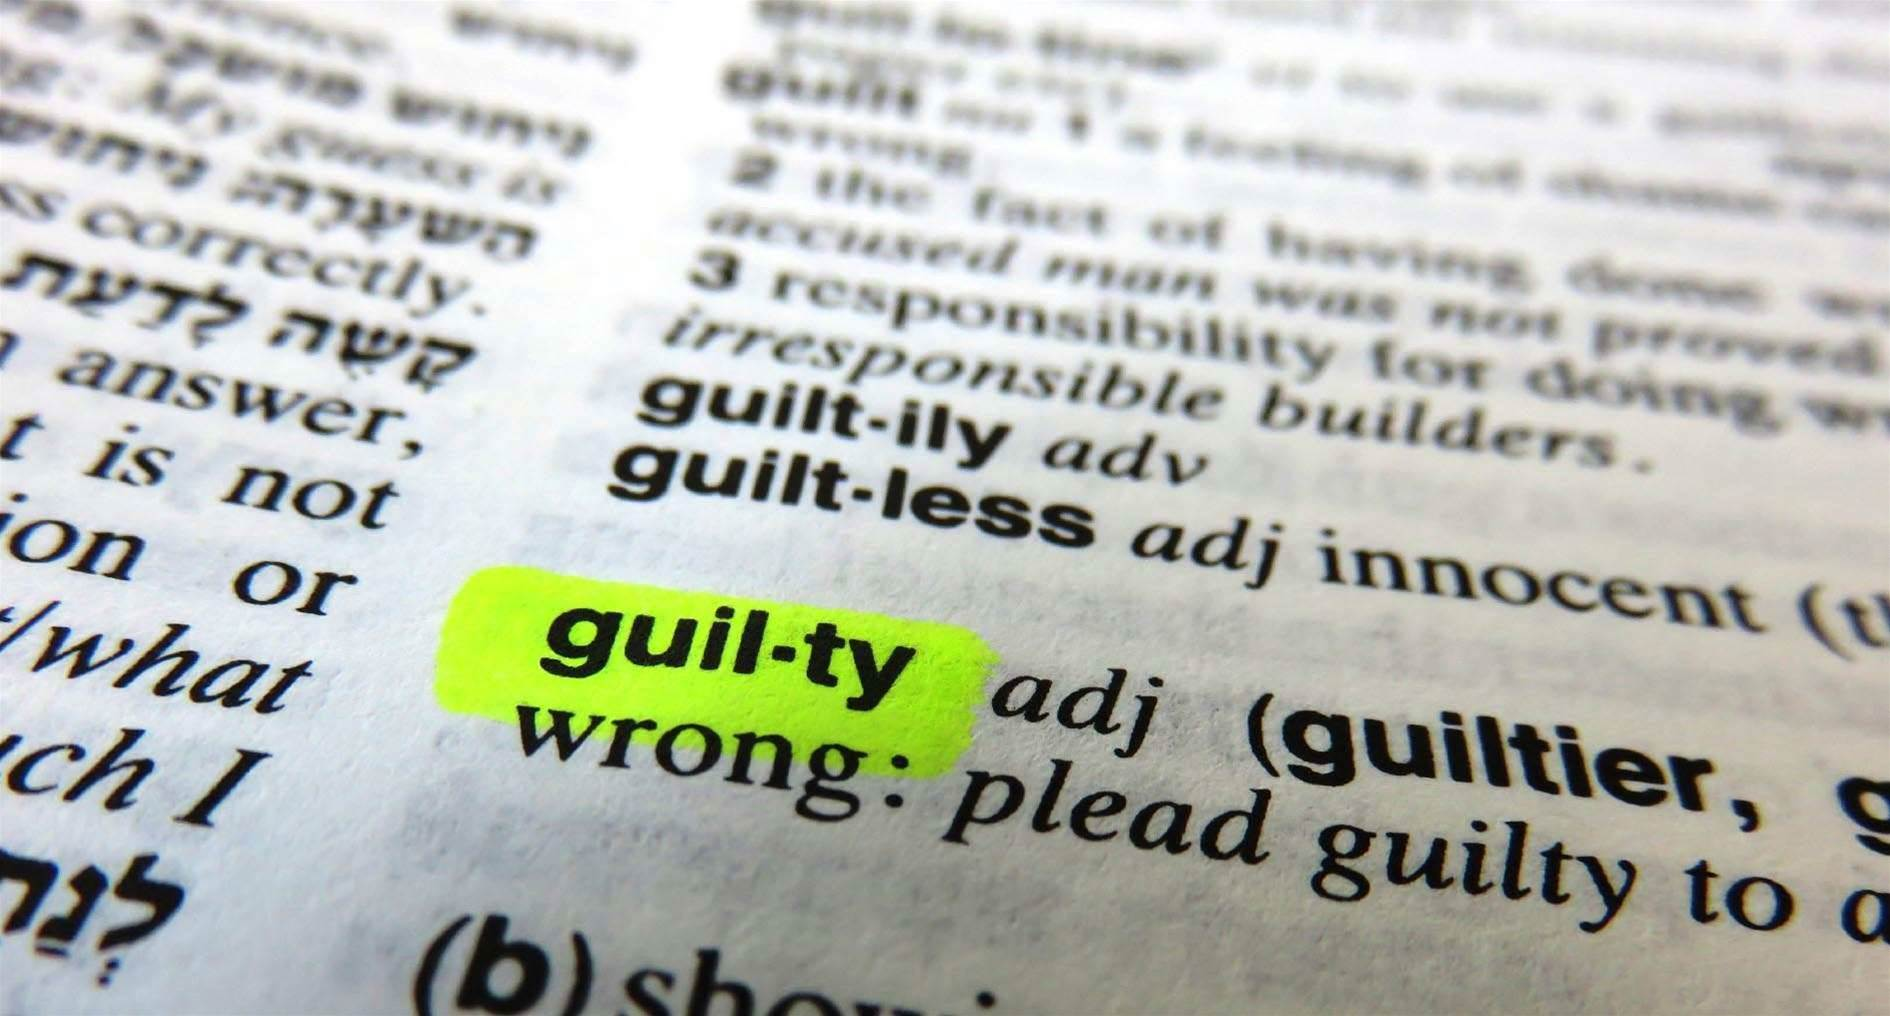 Alleged celebrity iCloud hacker to plead guilty